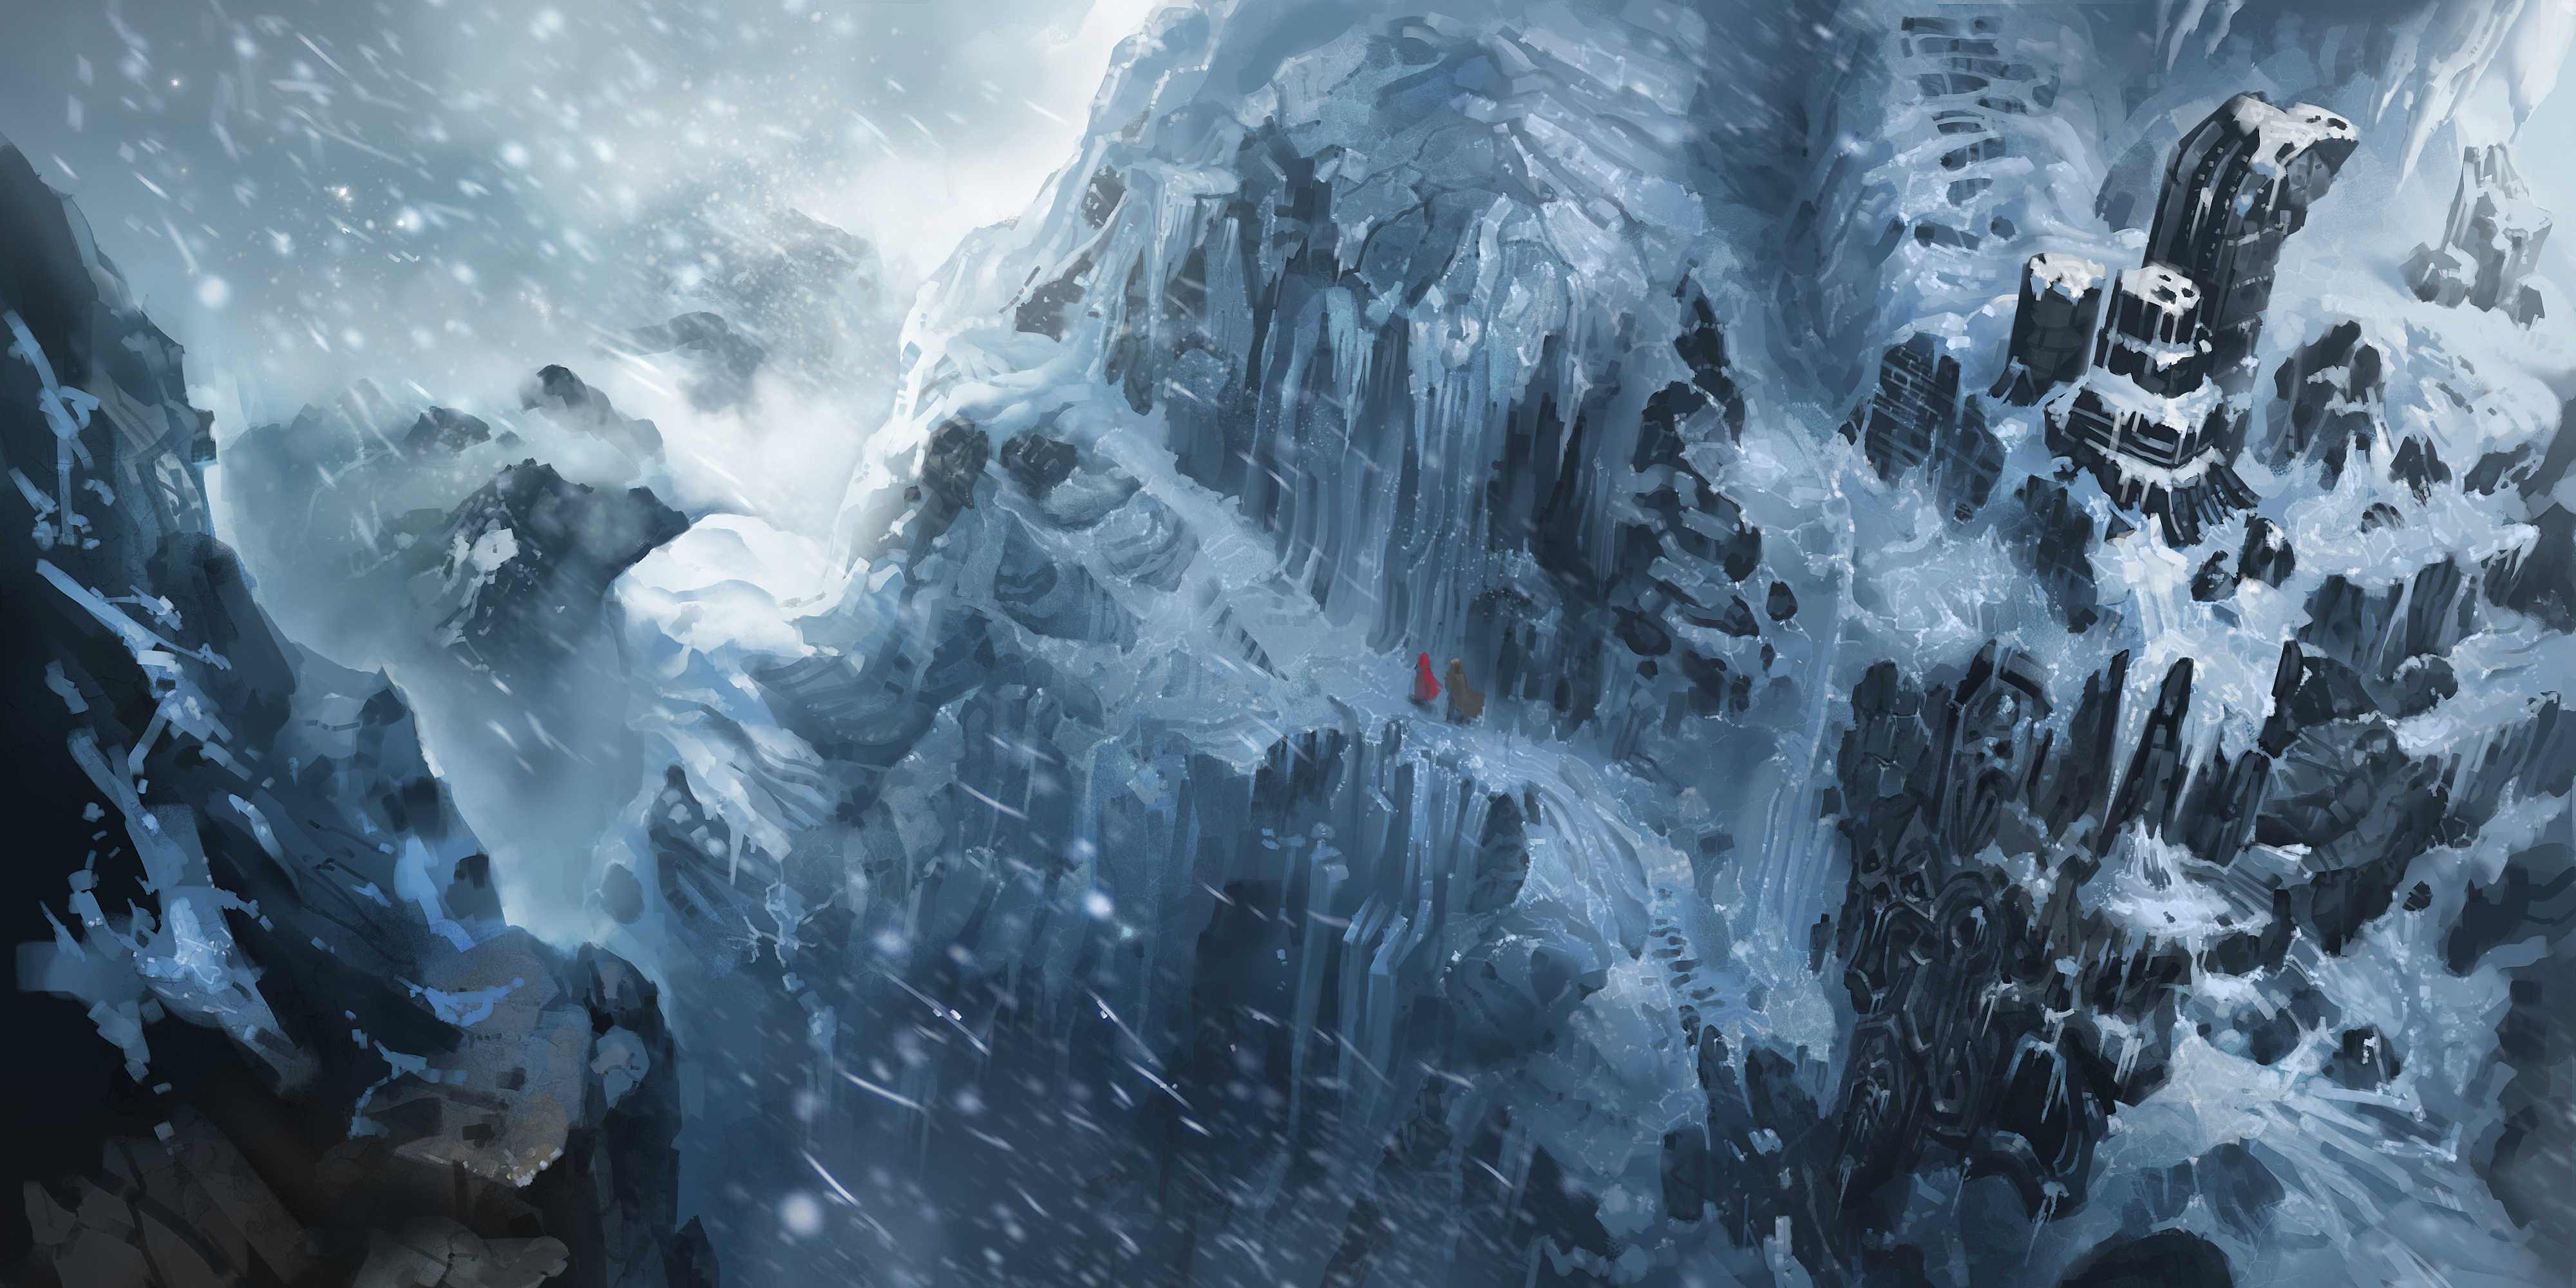 графика горы скалы снег зима рисунок graphics mountains rock snow winter figure без смс